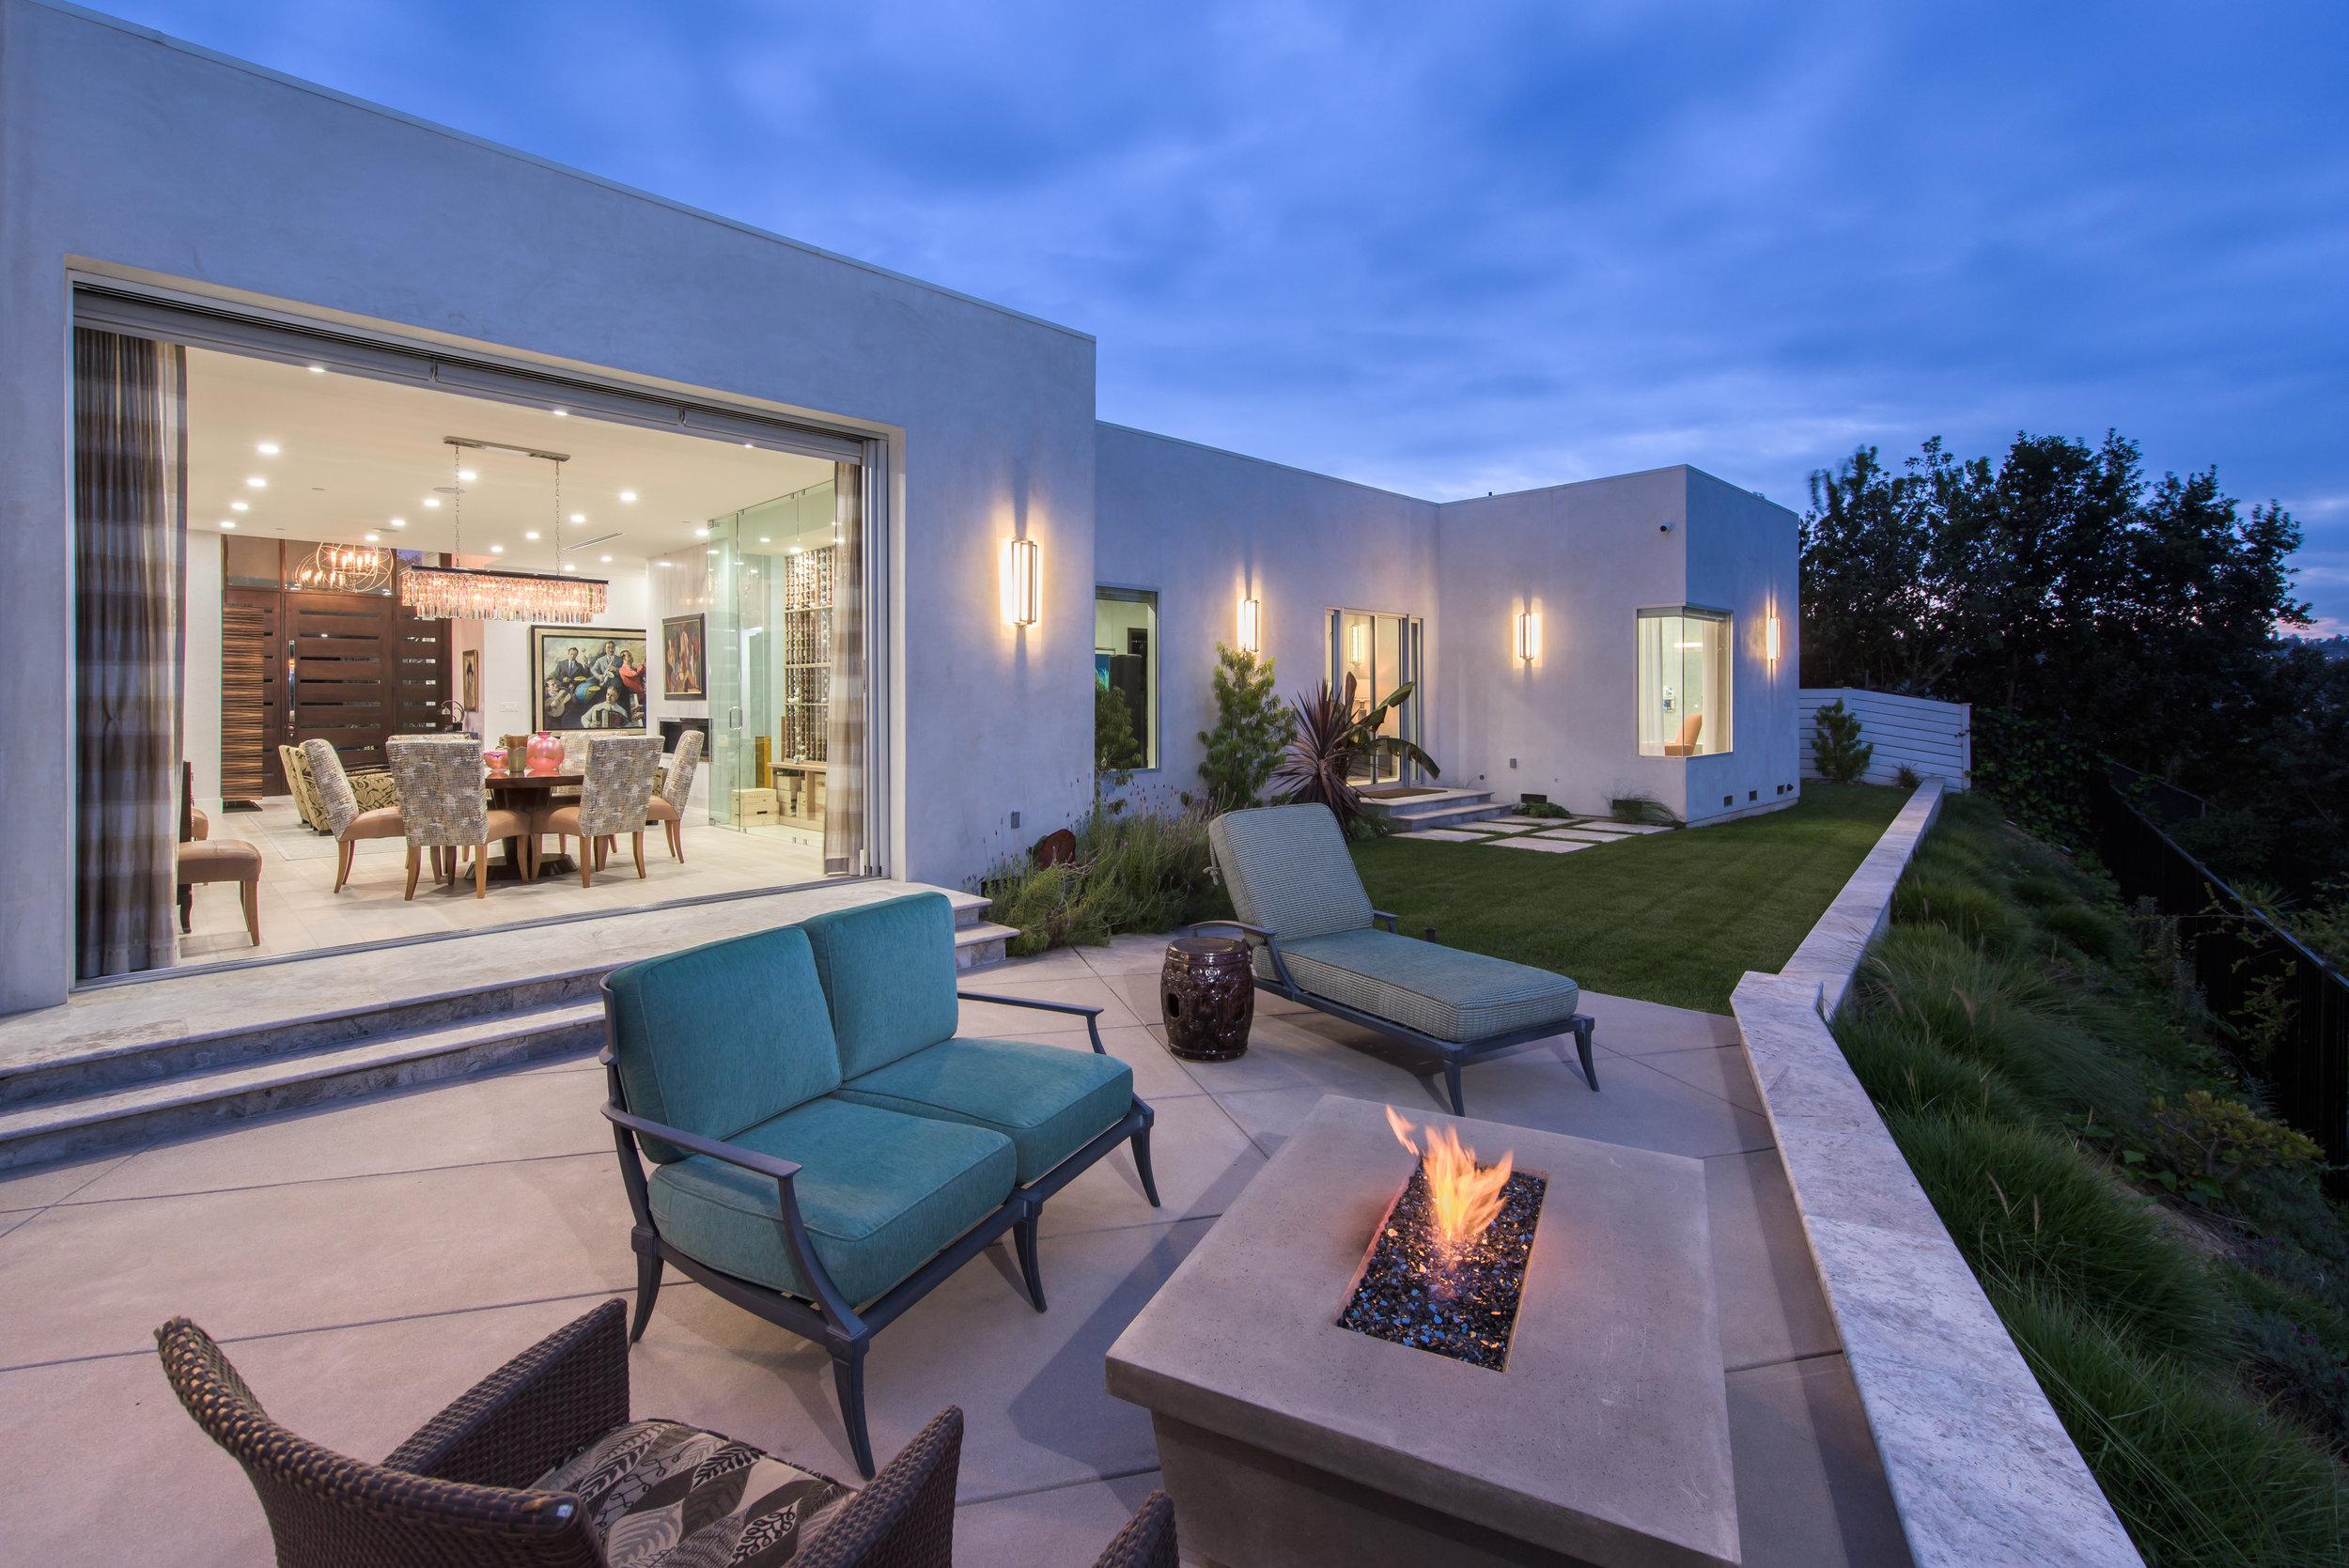 modern-architecture-studio-city-backyard.jpg